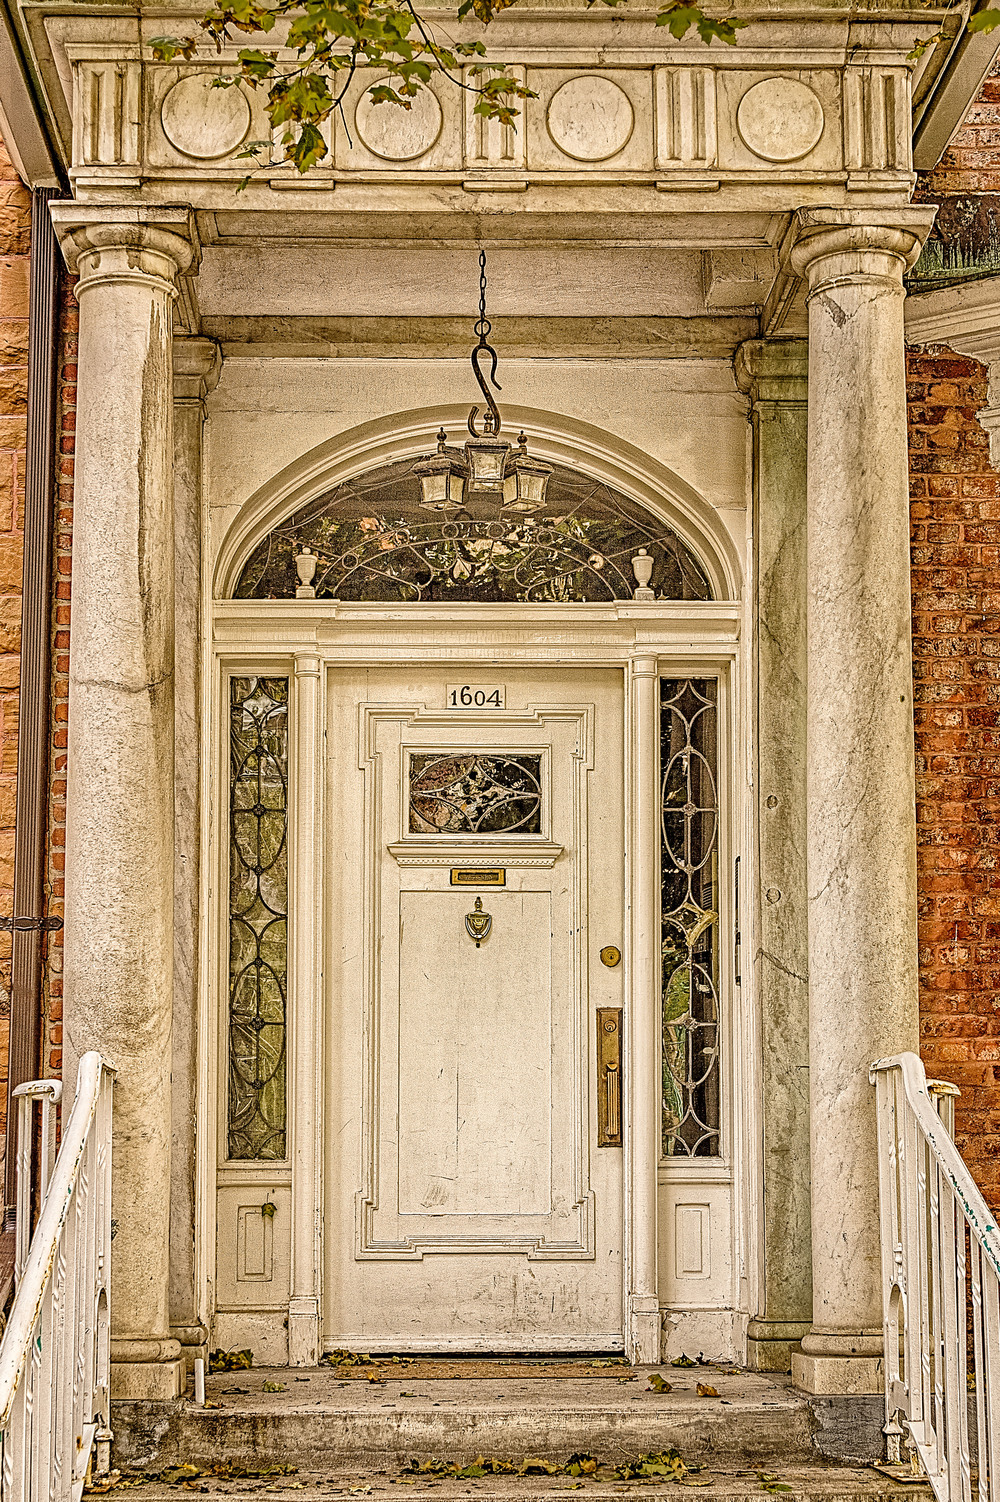 20130928_Doors-Pine Ave.__MG_1381_HDR-Edit.jpg